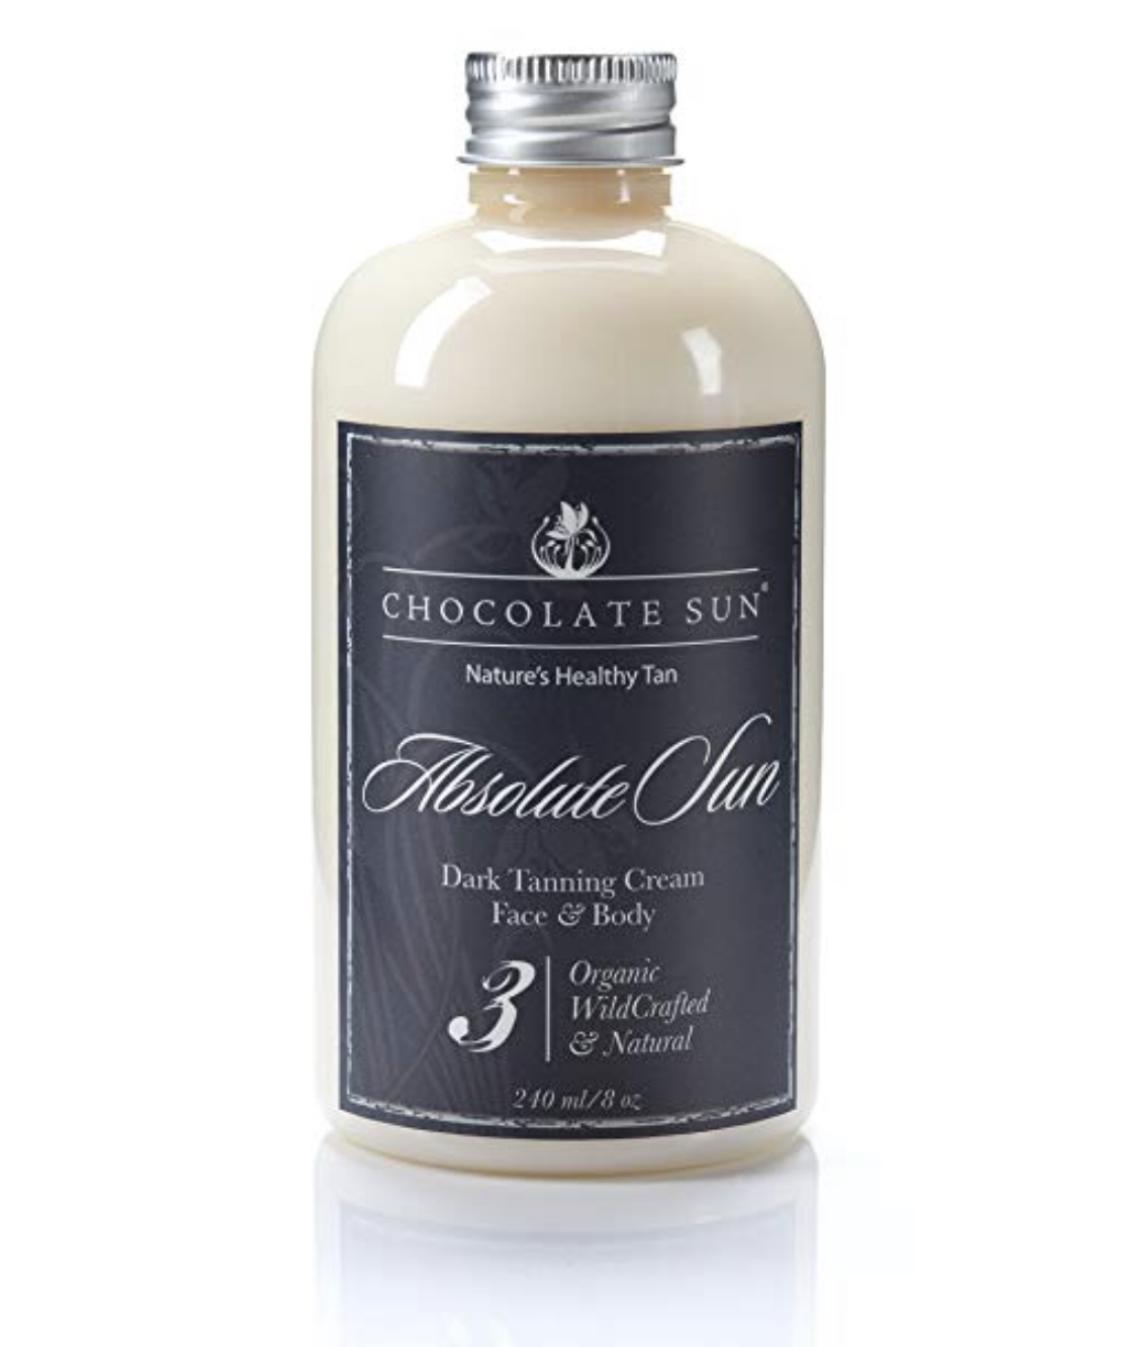 CHOCOLATE SUNAbsolute Sun Tanning Cream -